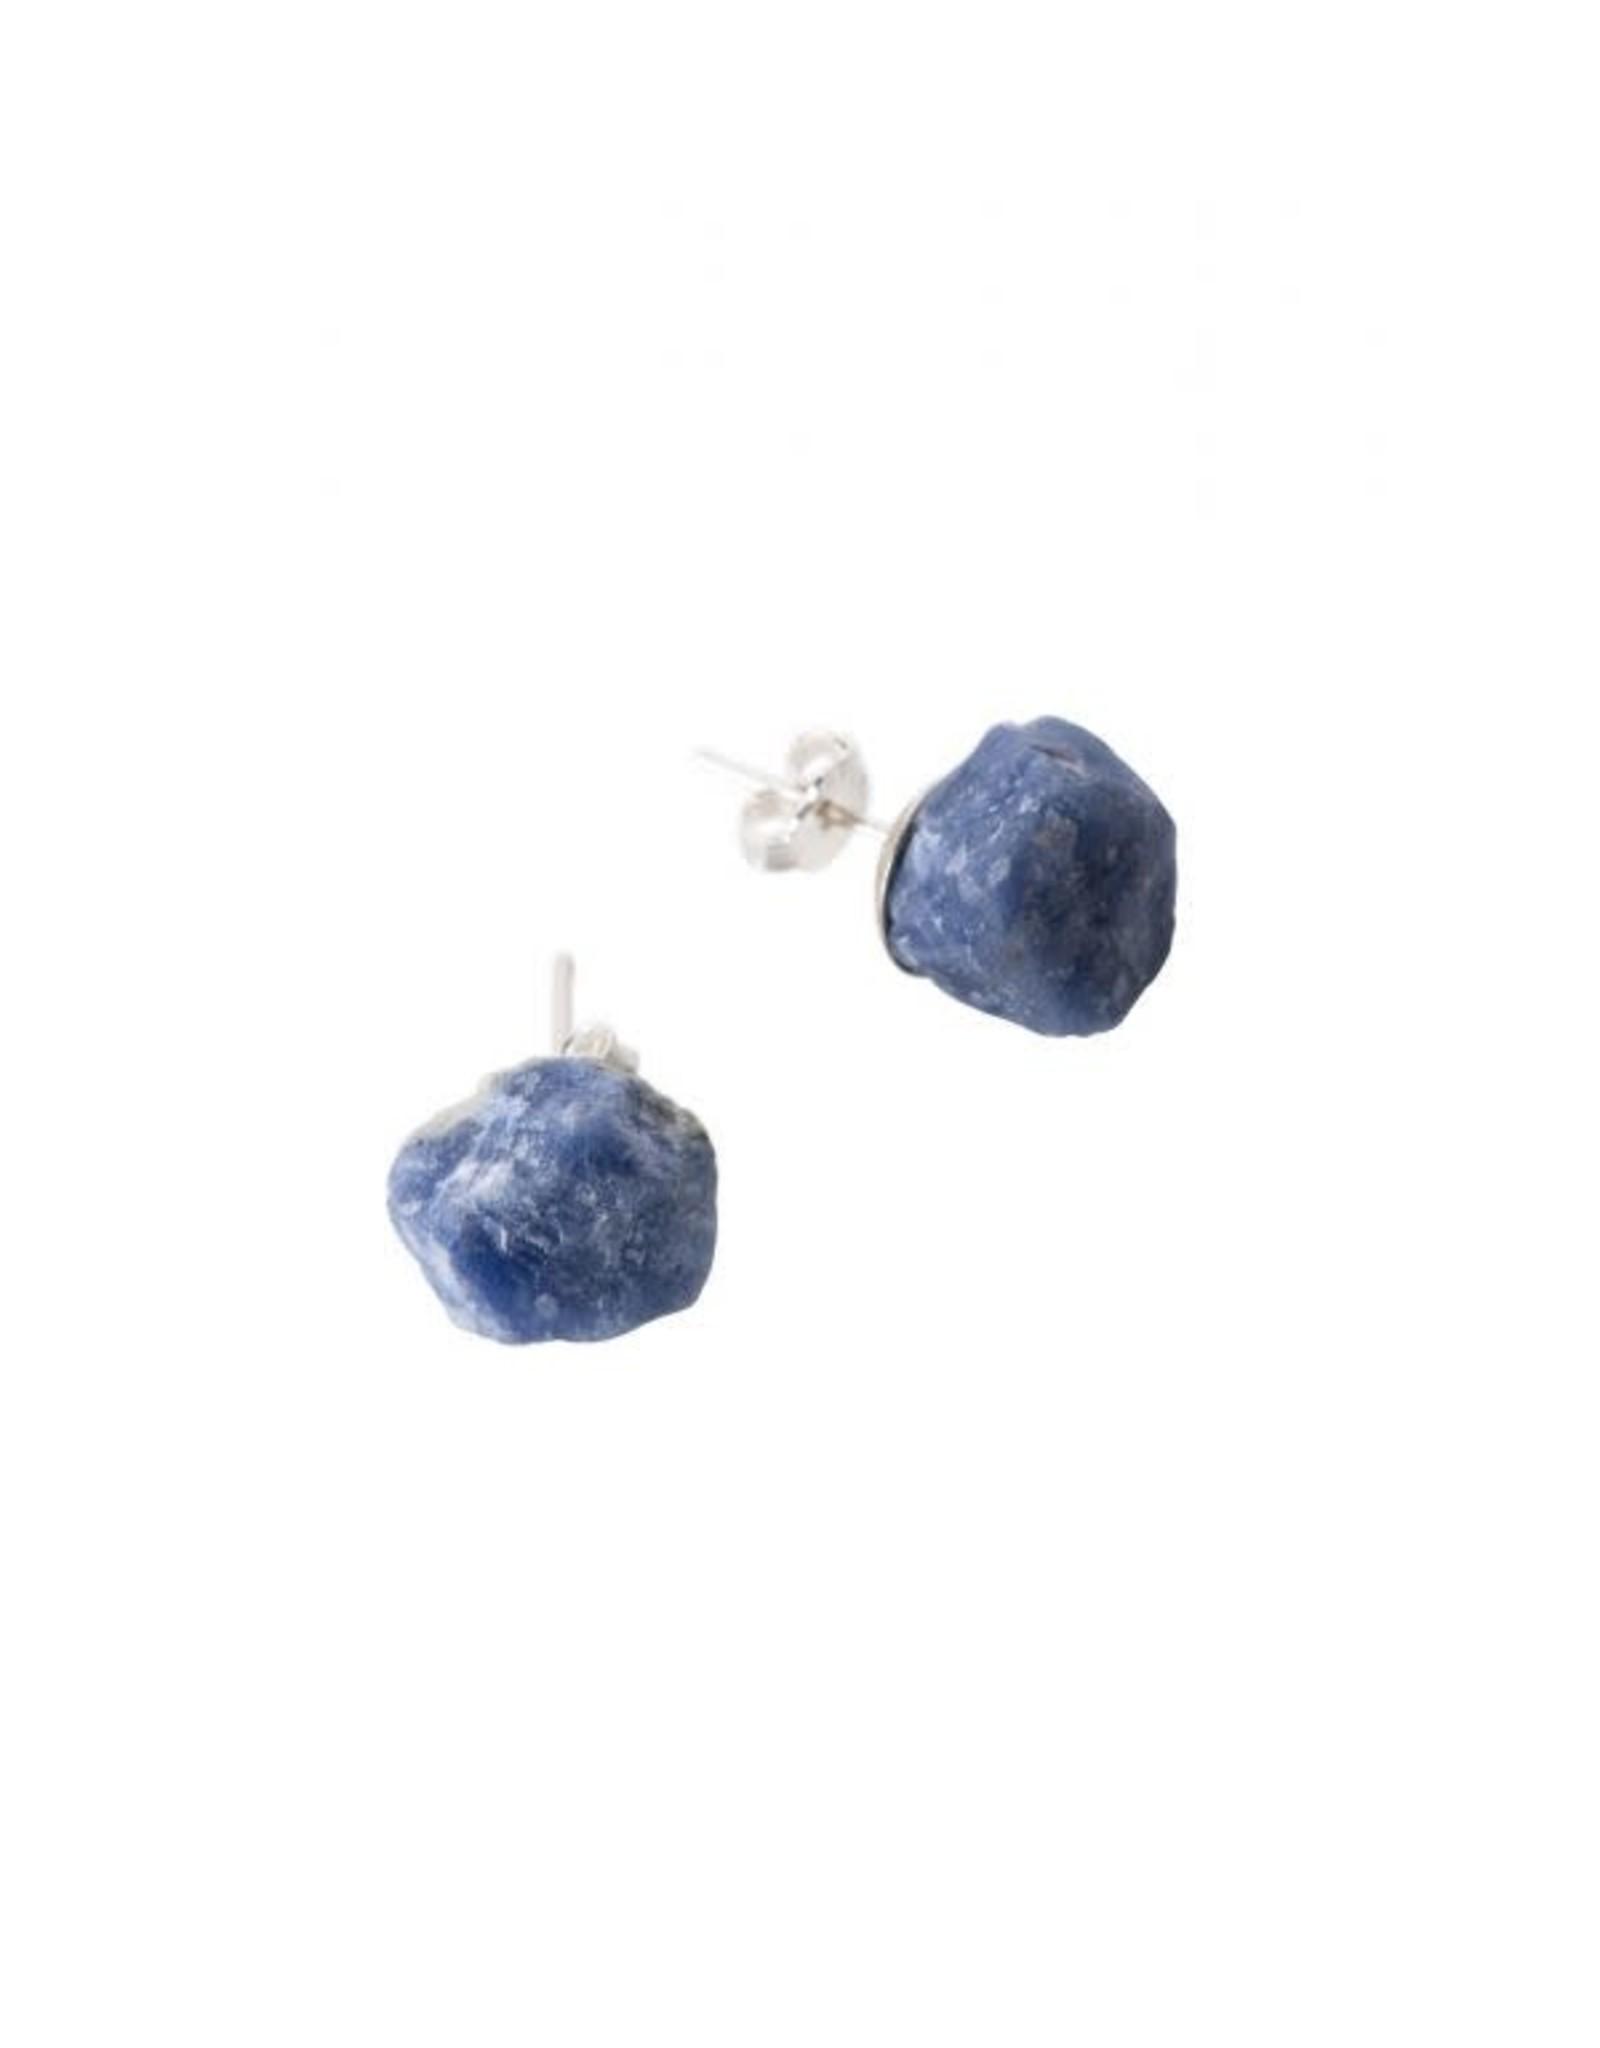 Rough Stone Sterling Earrings, Sodalite